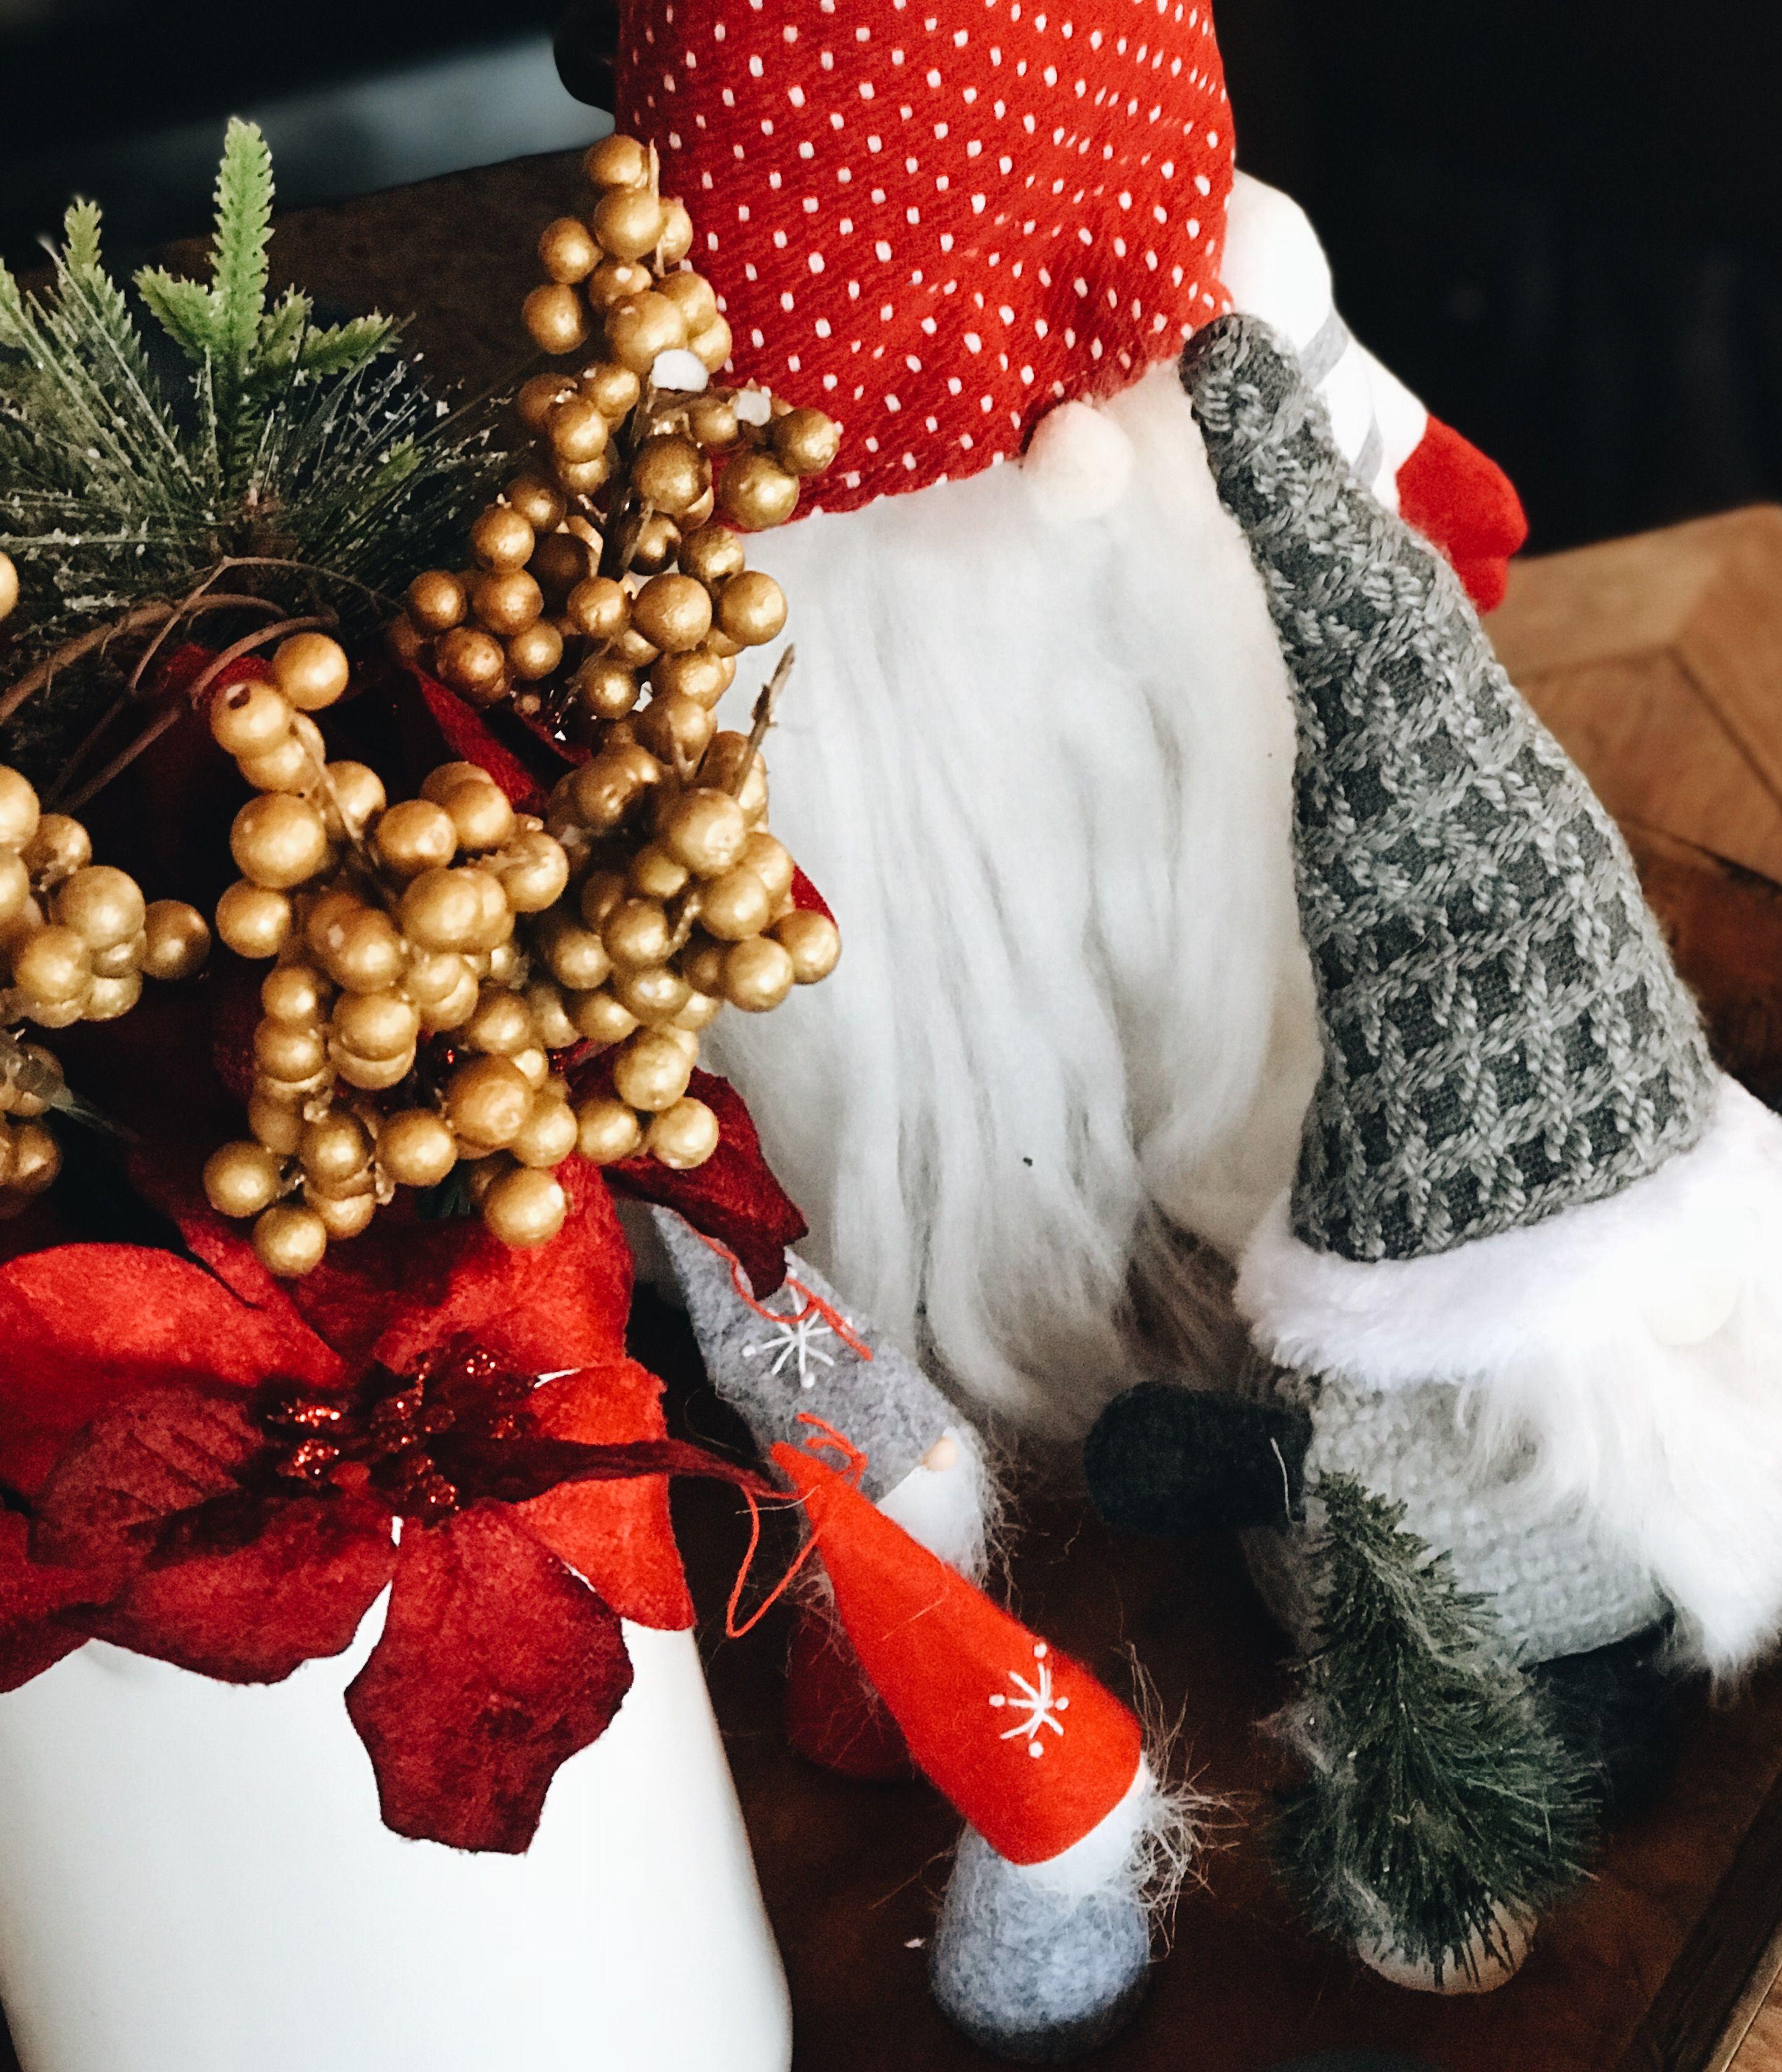 Scandinavian Nordic Gnome Christmas Decor An Original Photo By Cynthia